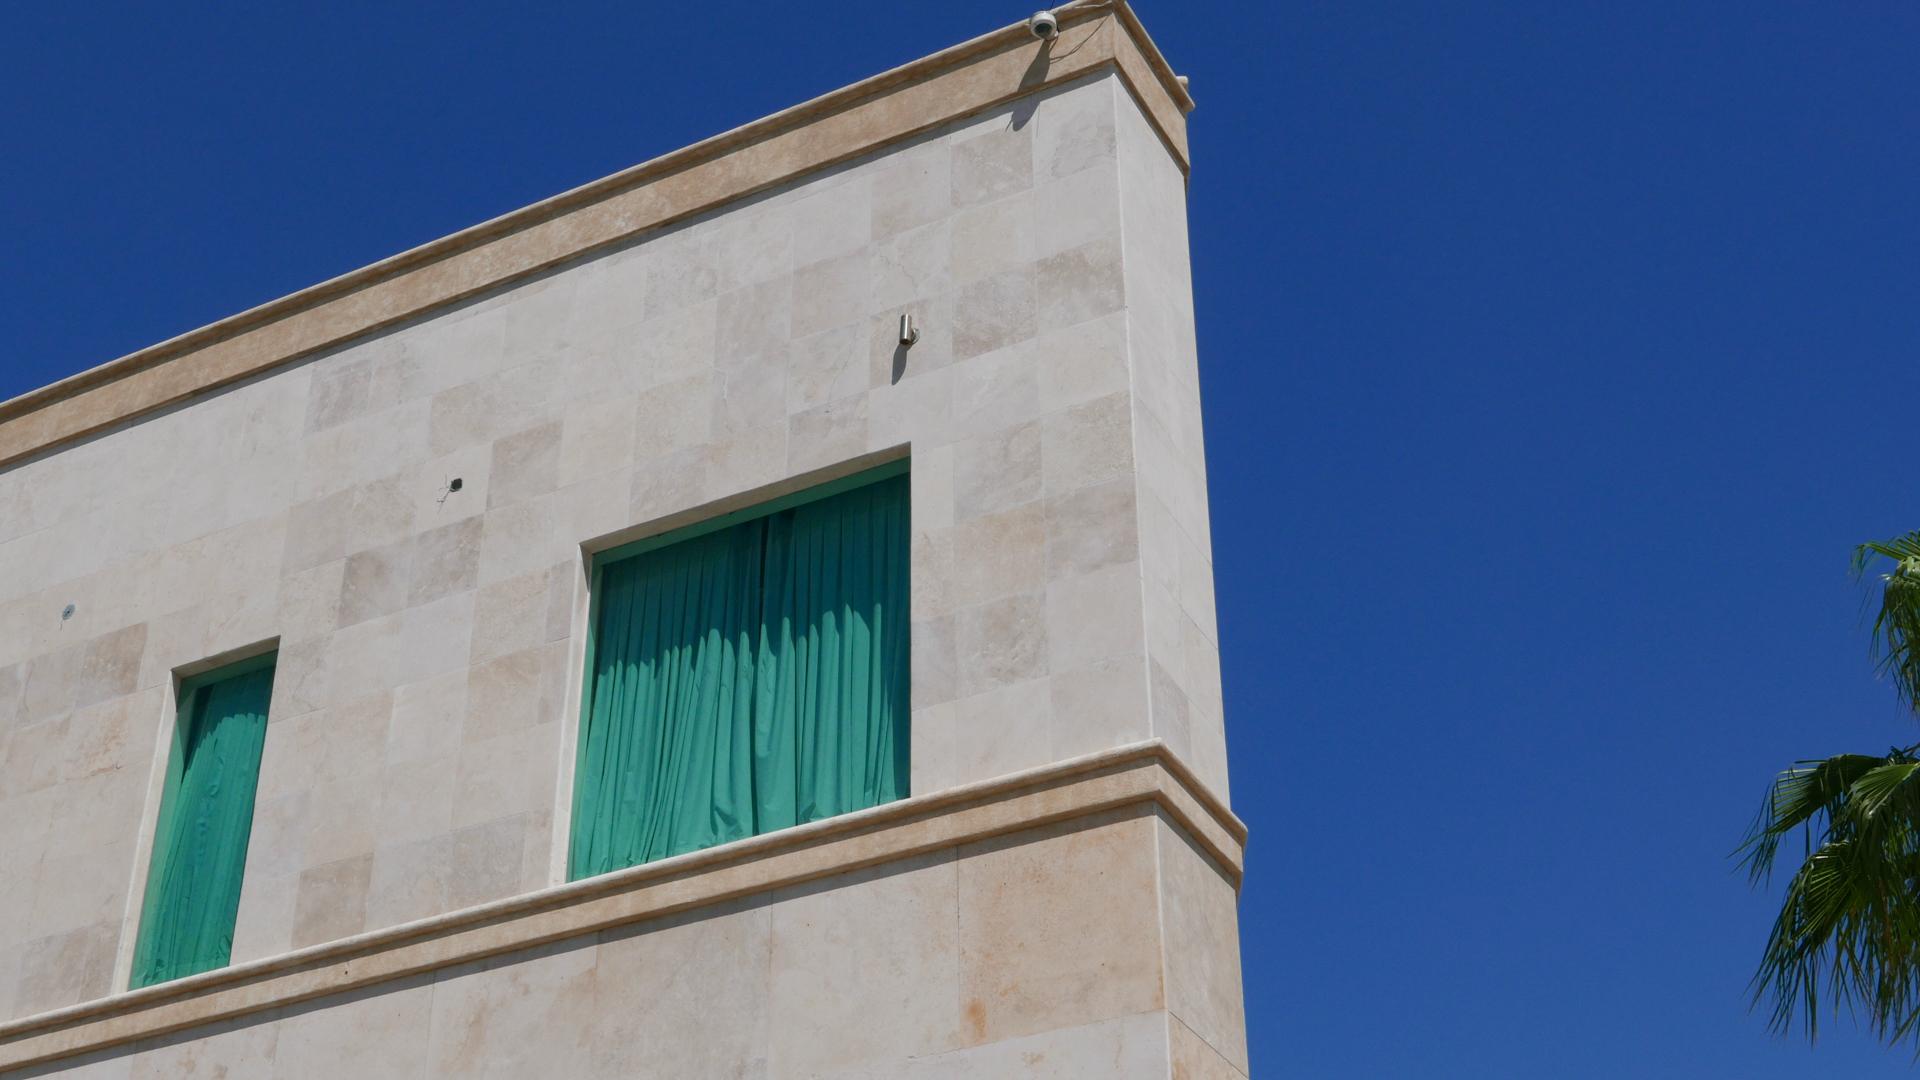 cabo-san-lucas-hotel-curtains.jpg